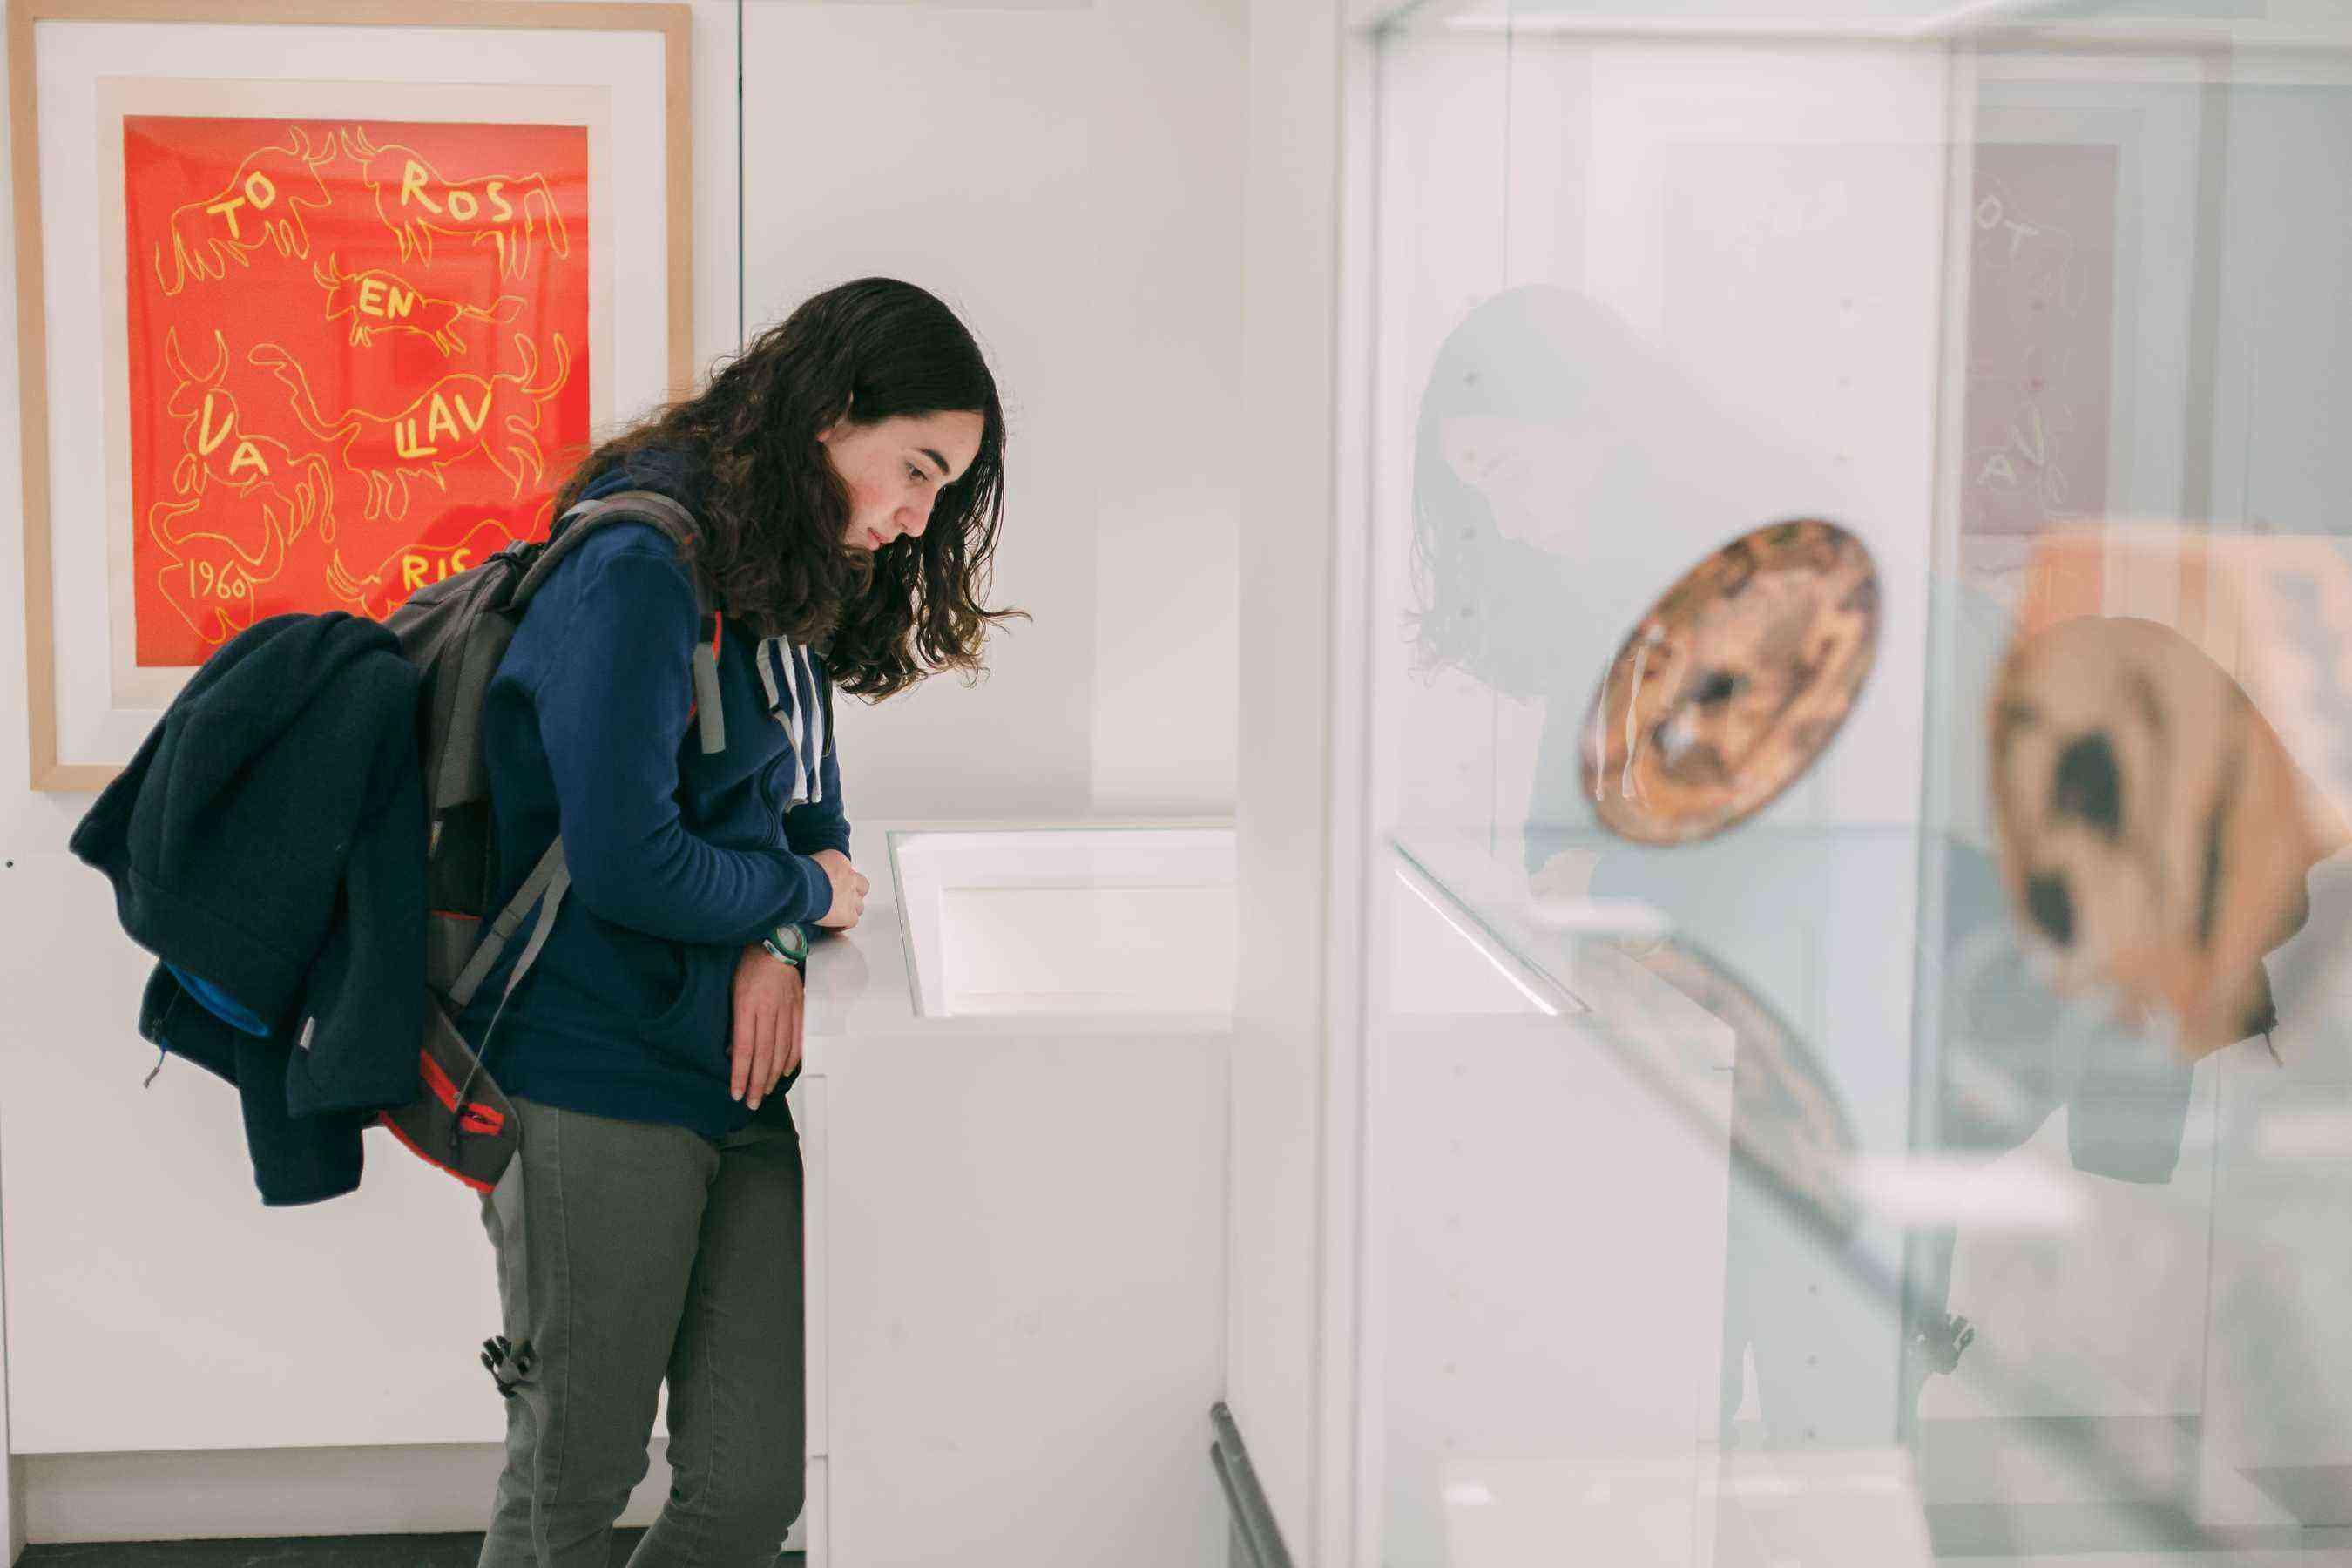 Mediaci+¦n cultural Museo Picasso Colecci+¦n Eugenio Arias. Foto de Guillermo Gumiel